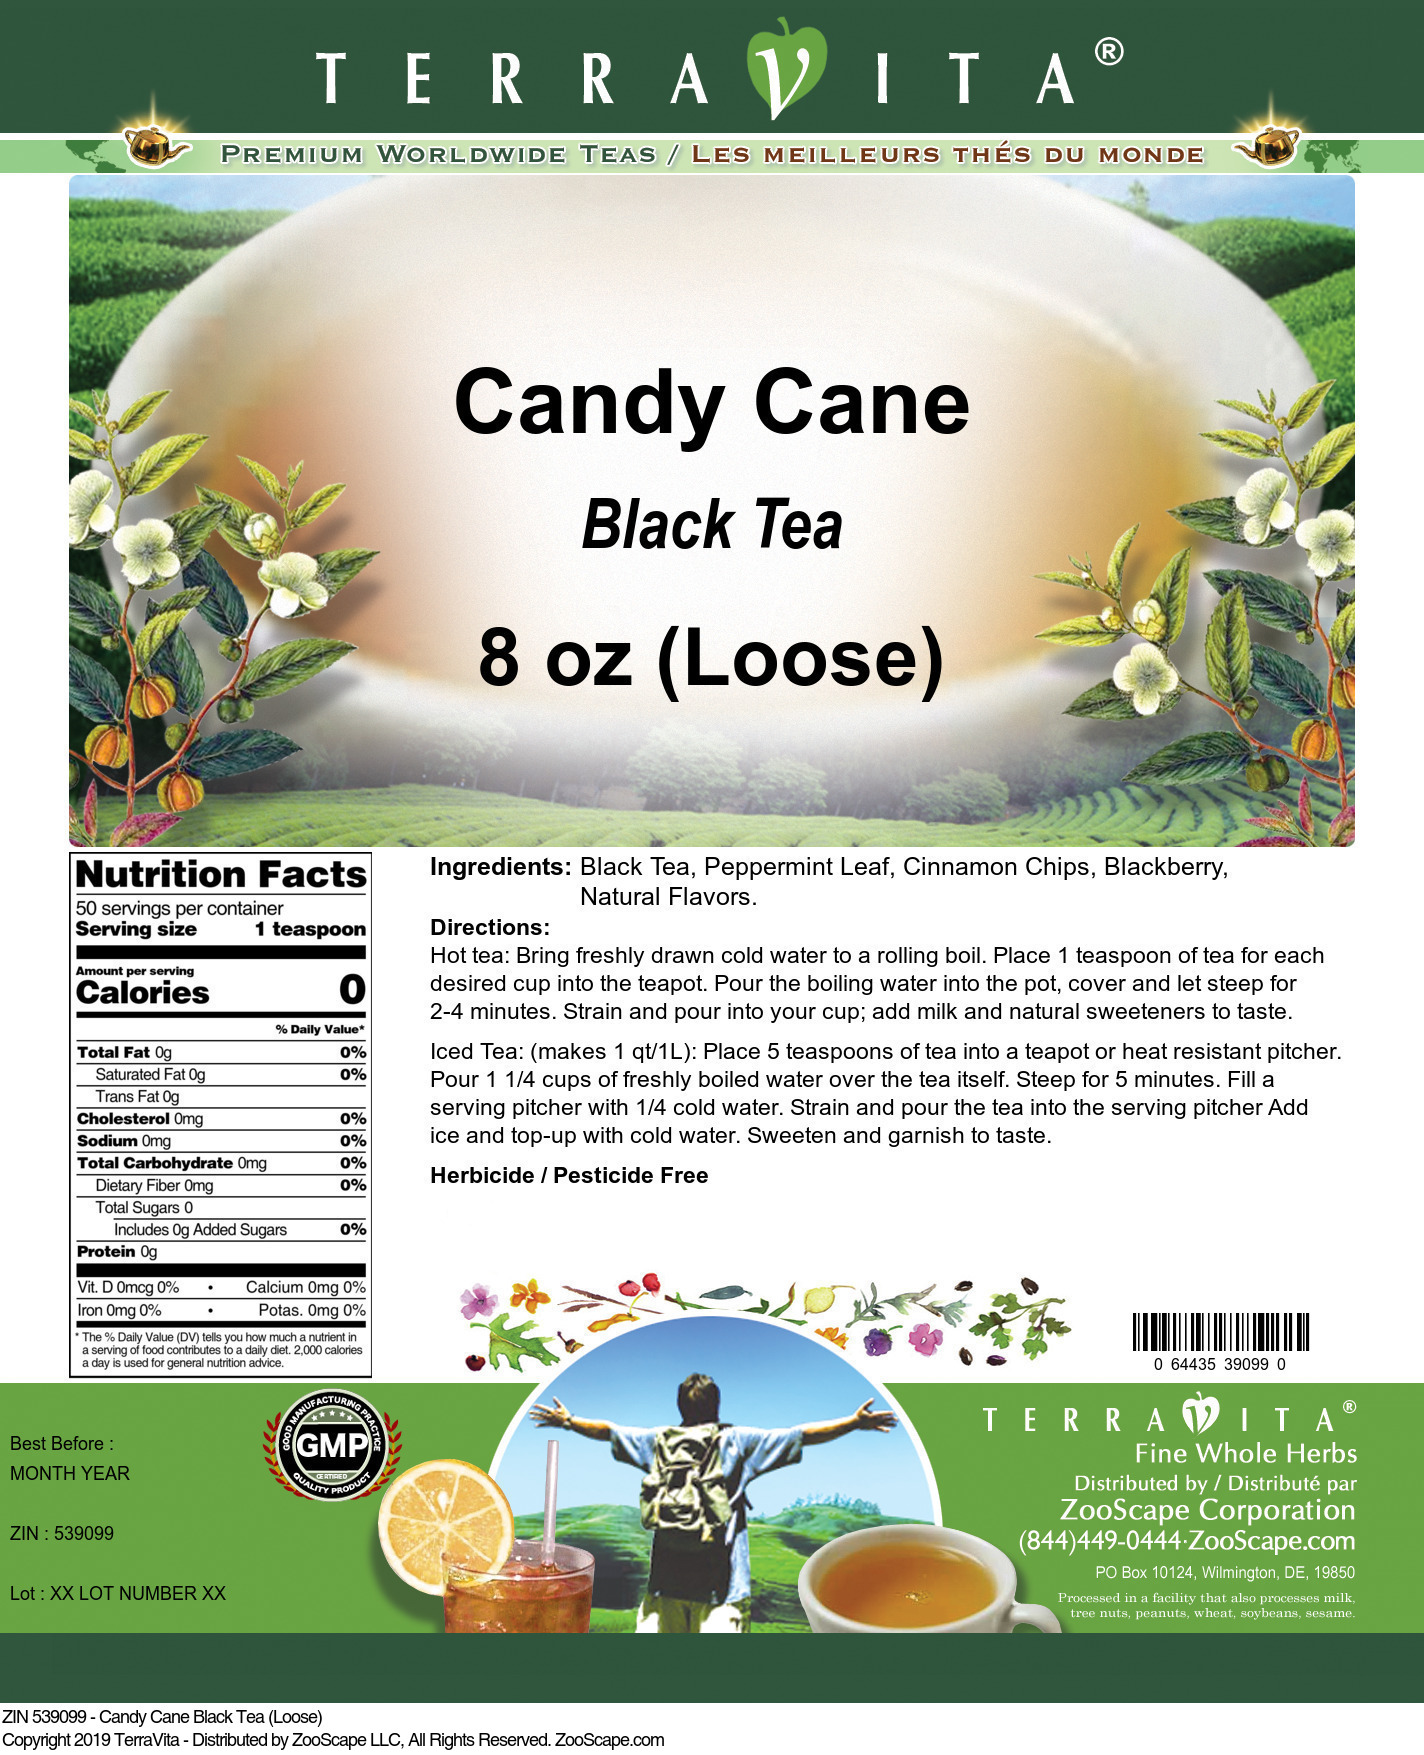 Candy Cane Black Tea